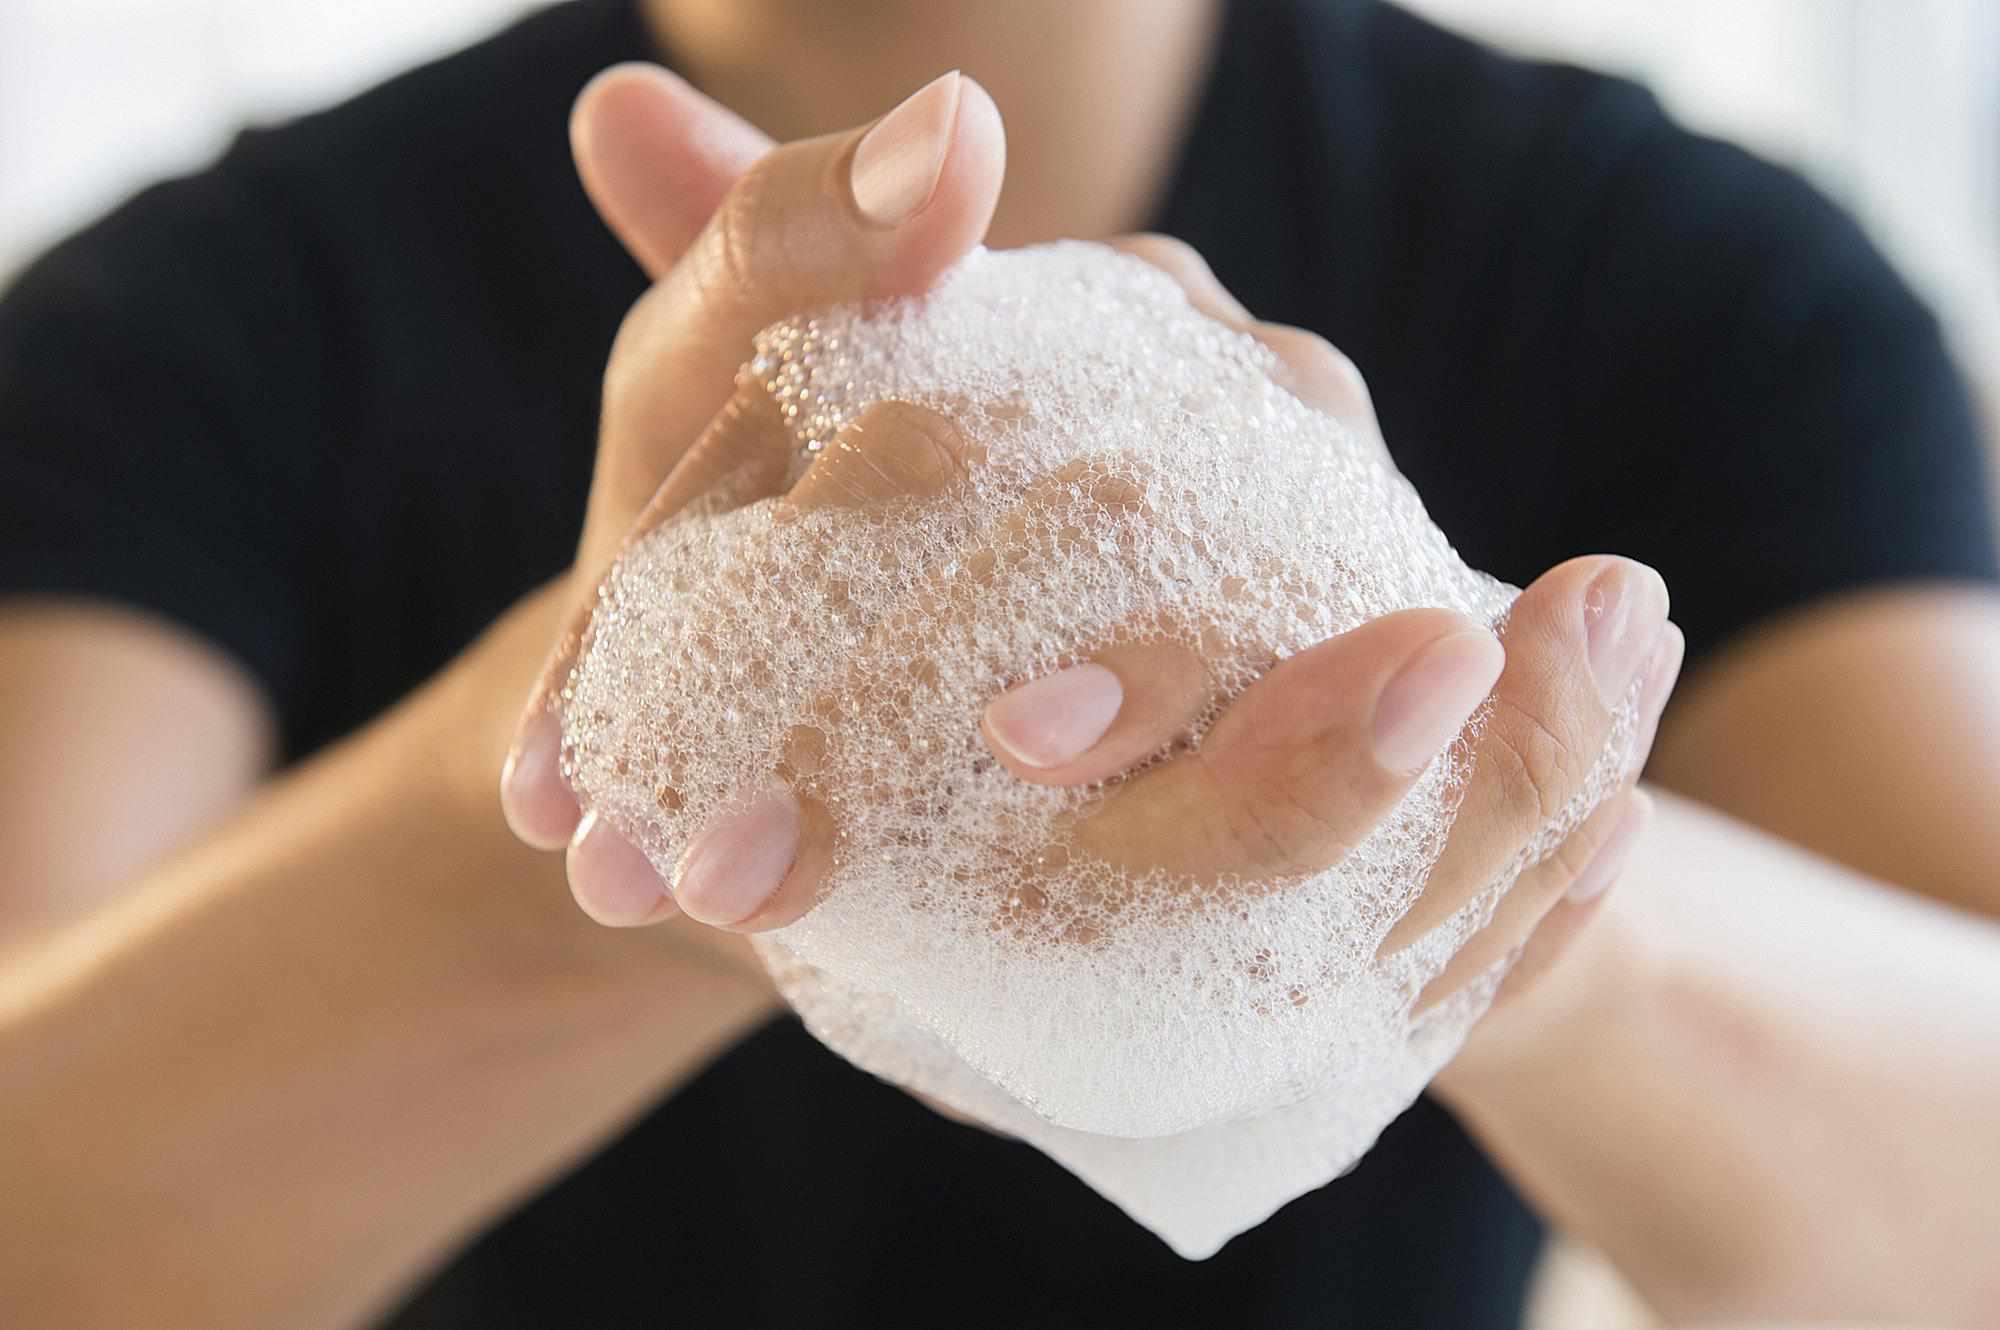 Close up of mixed race man washing his hands